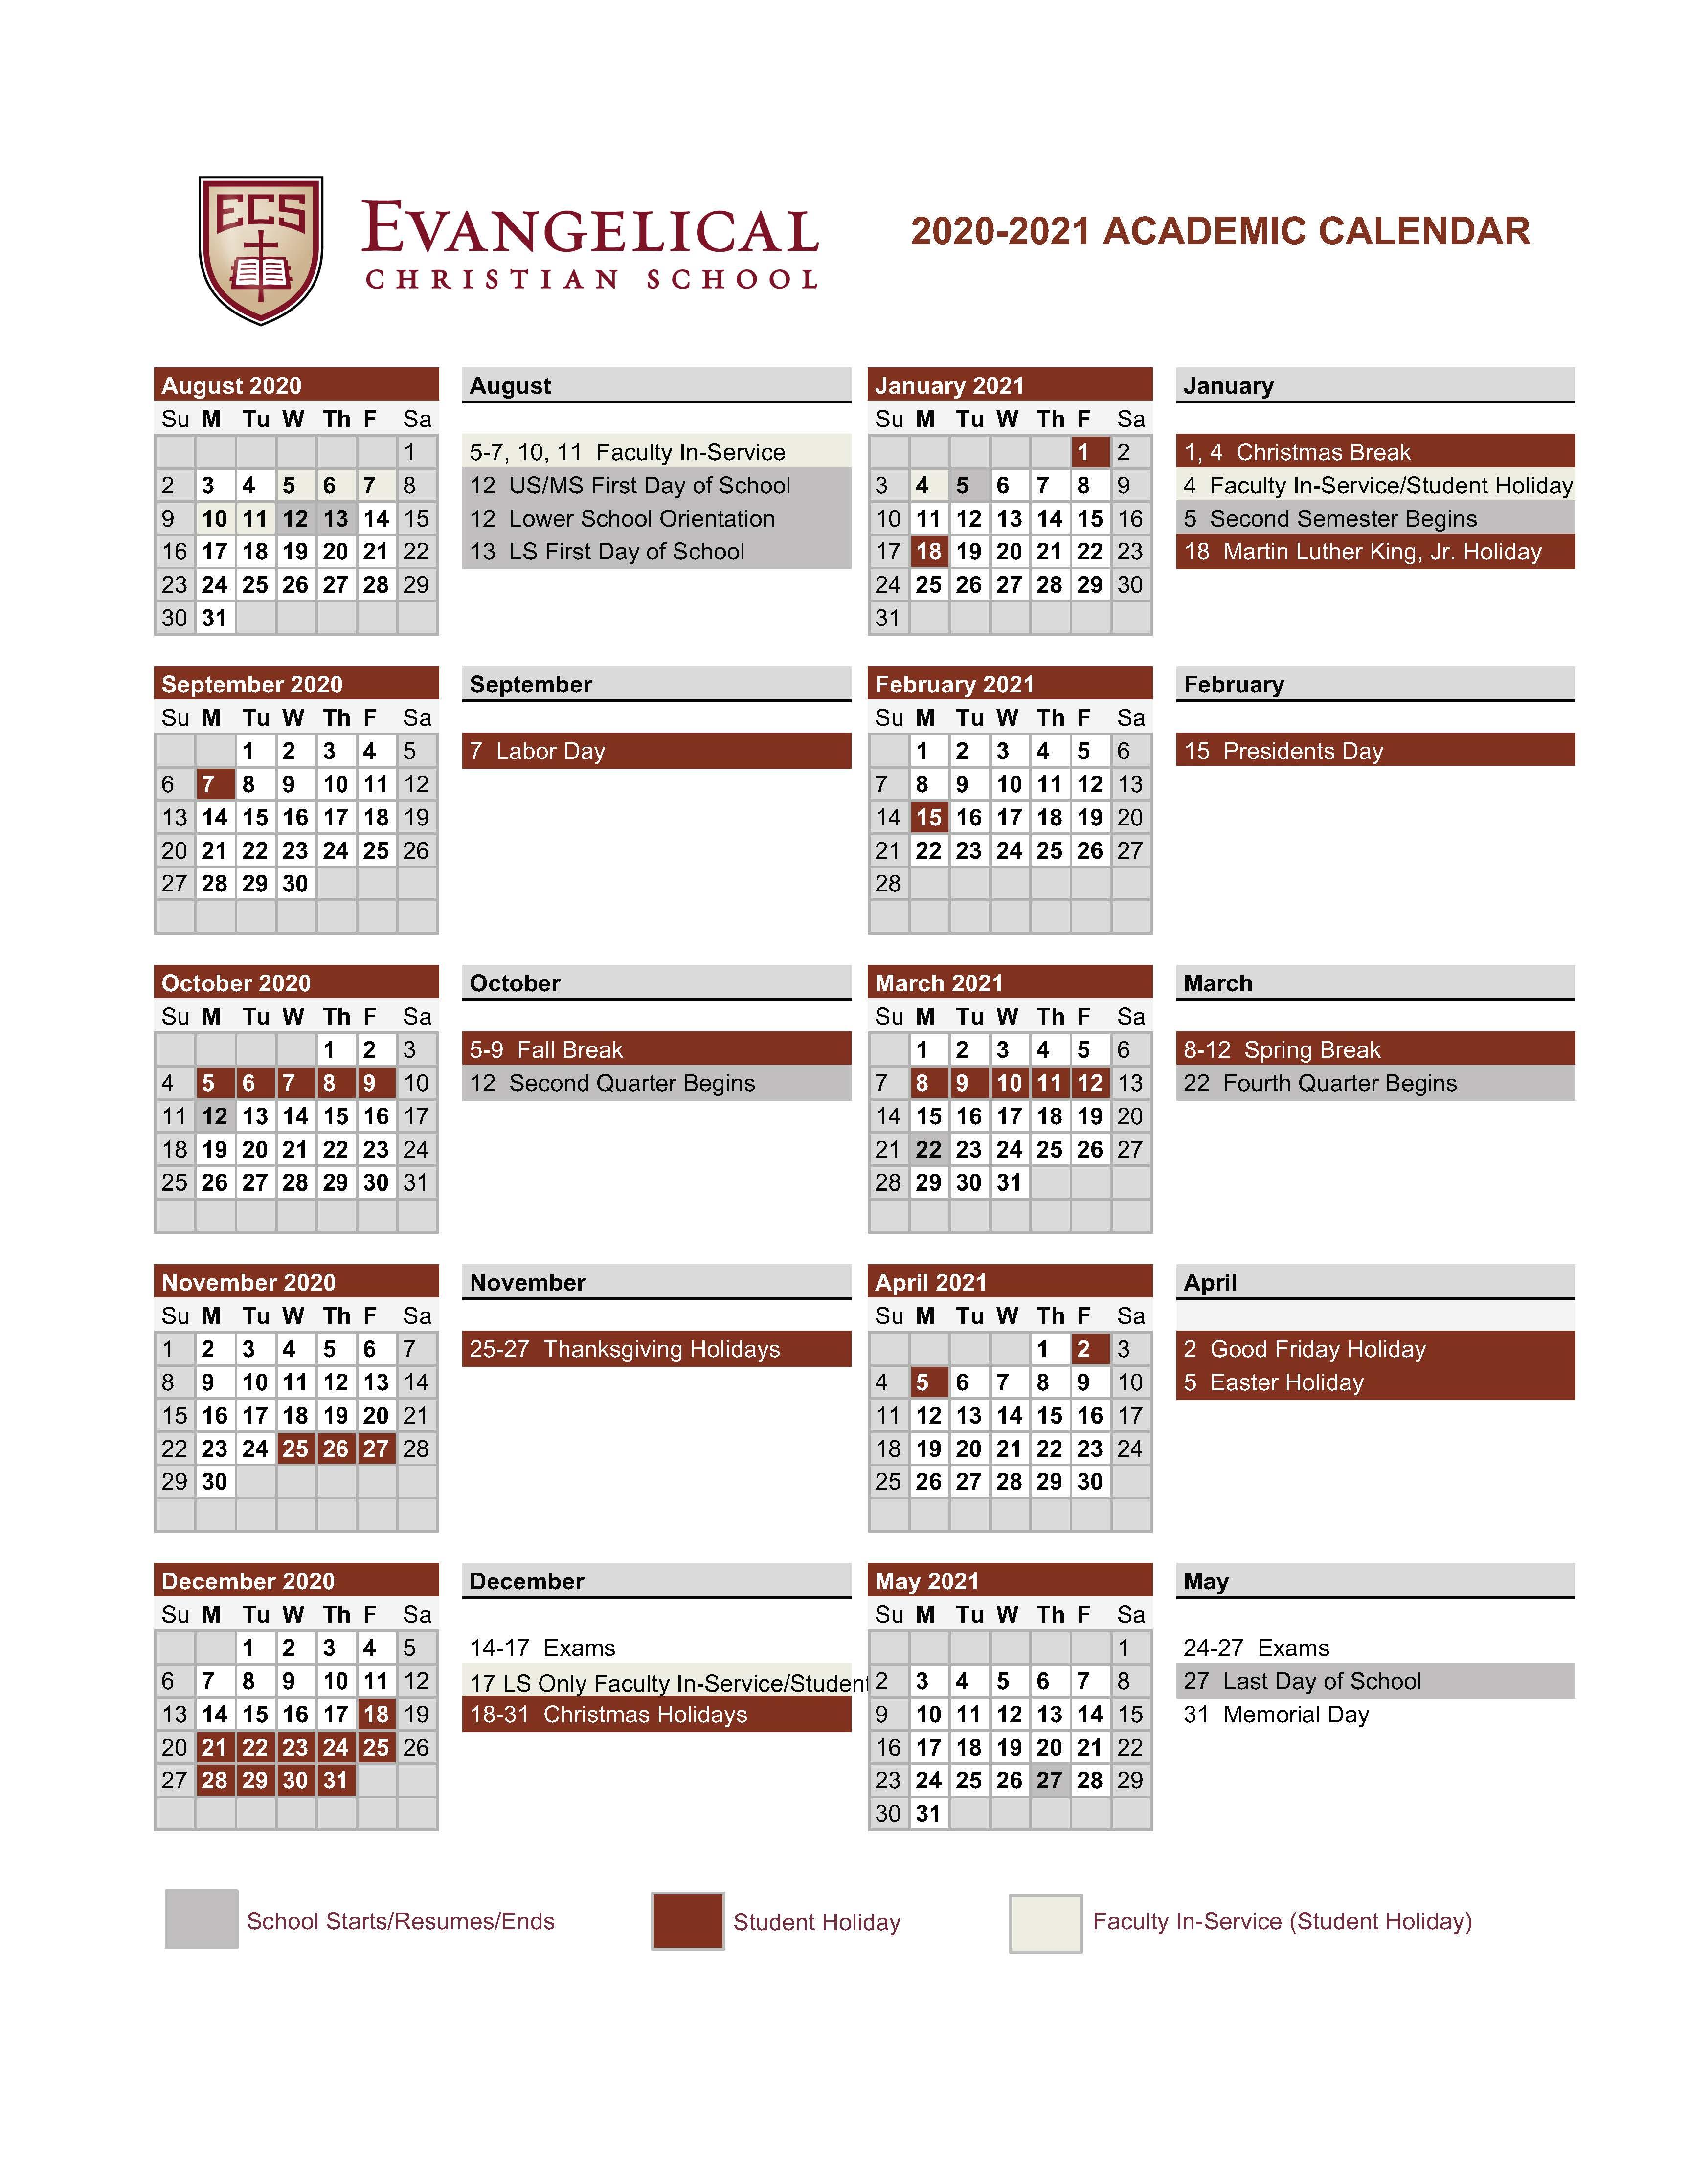 Scc Academic Calendar 2021 LS News   Evangelical Christian School